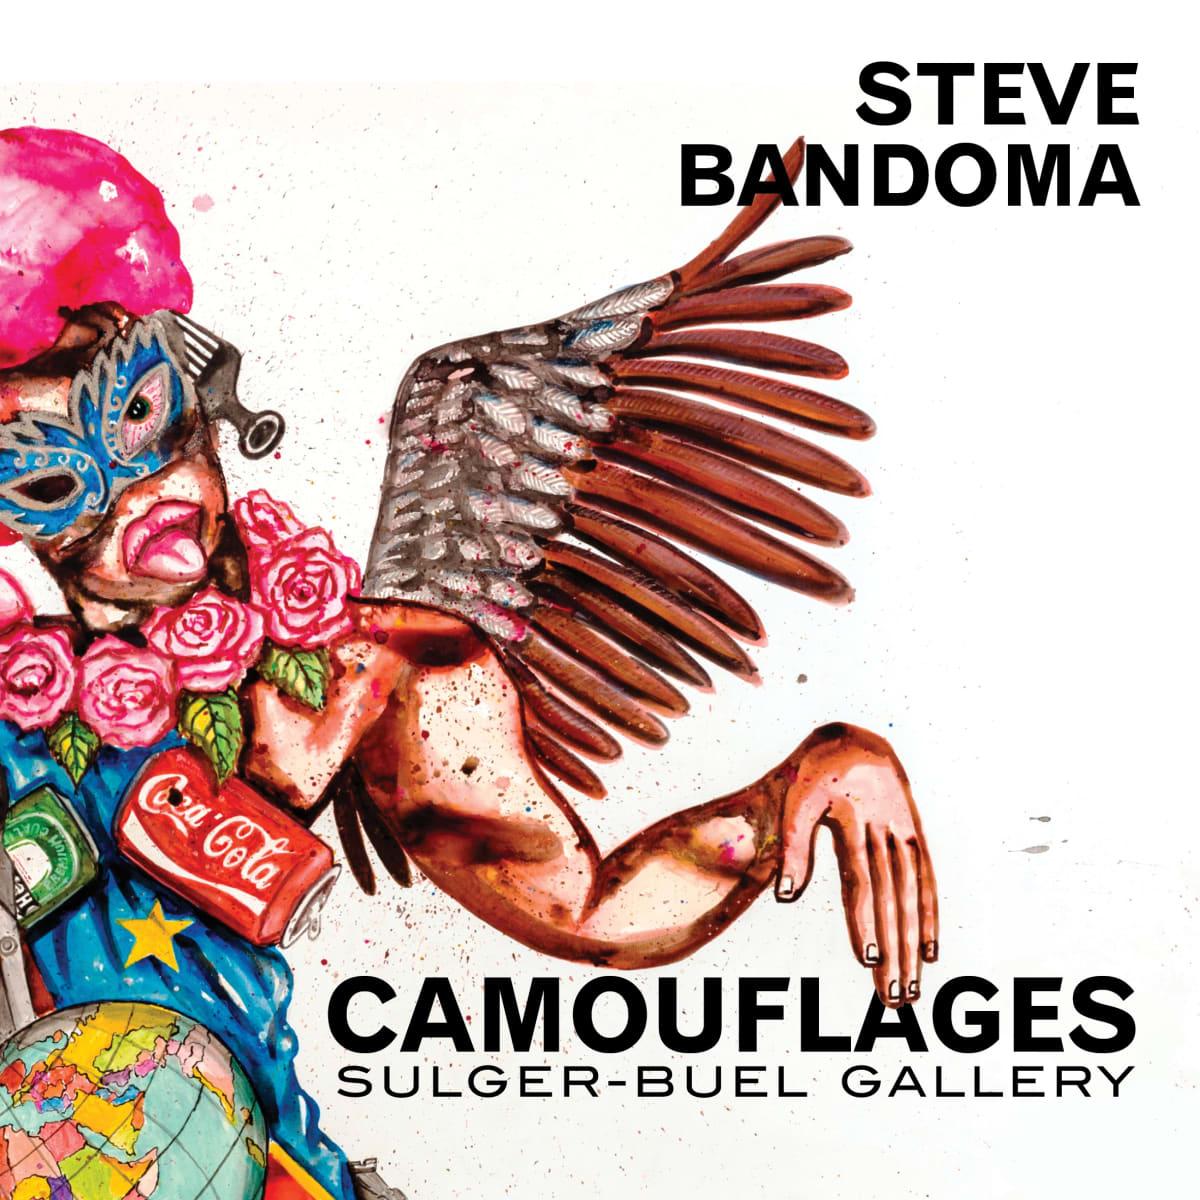 'CAMOUFLAGES' STEVE BANDOMA